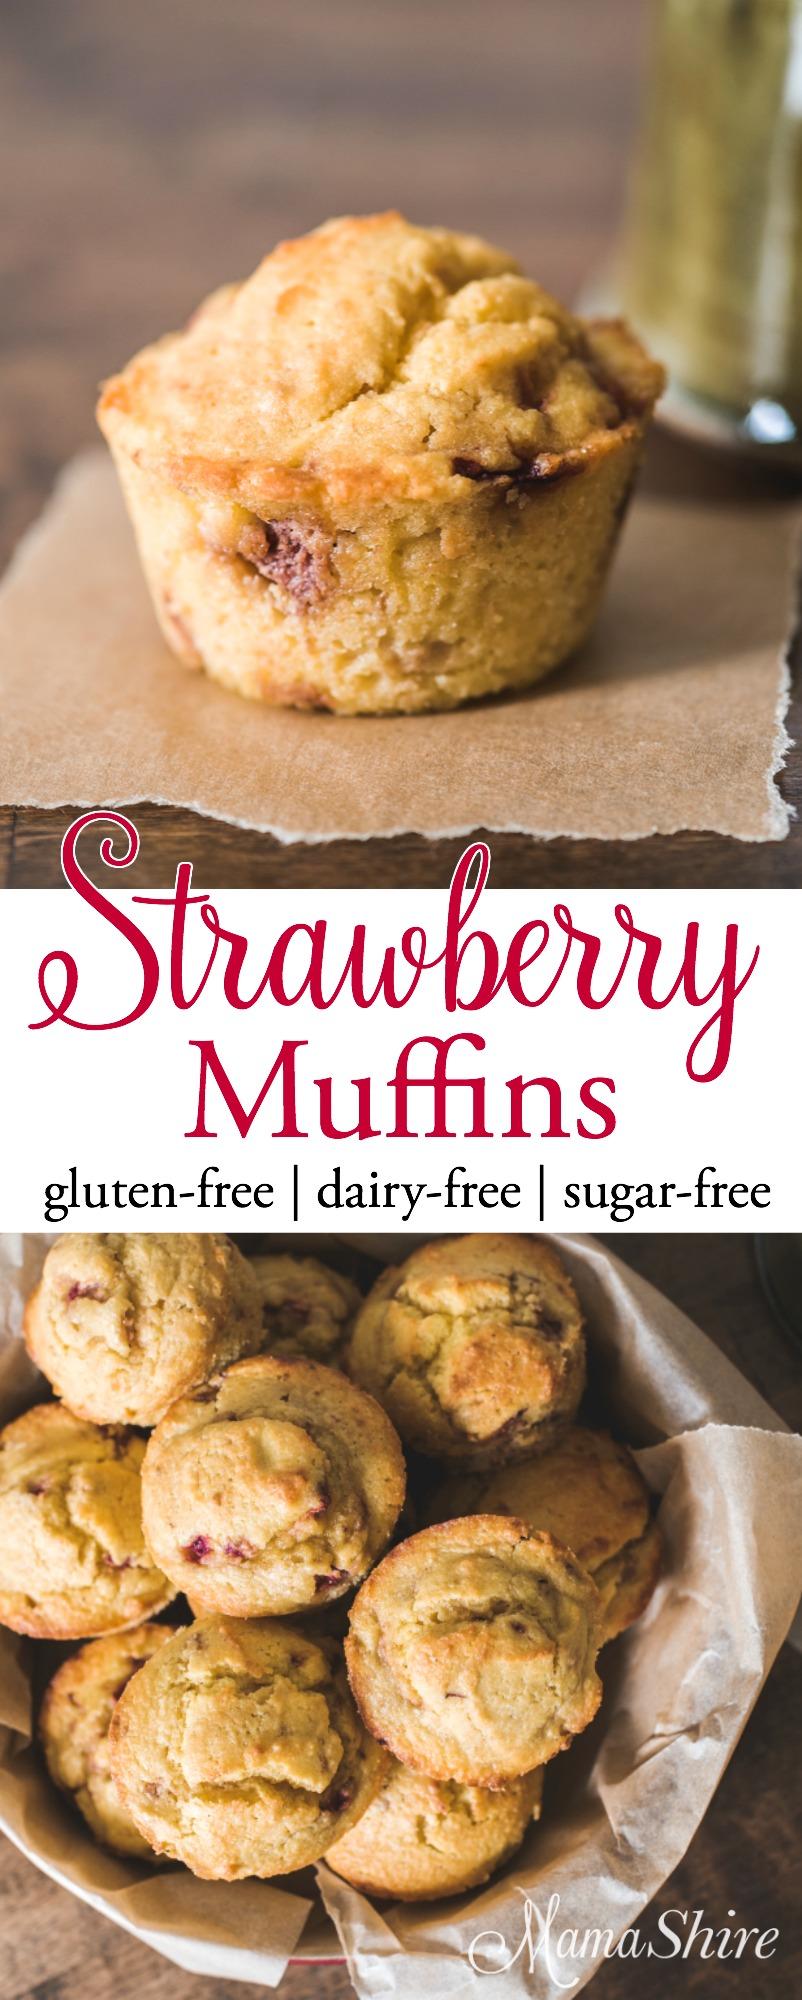 Strawberry Muffins Gluten-free, Dairy-free, Sugar-free, THM-S